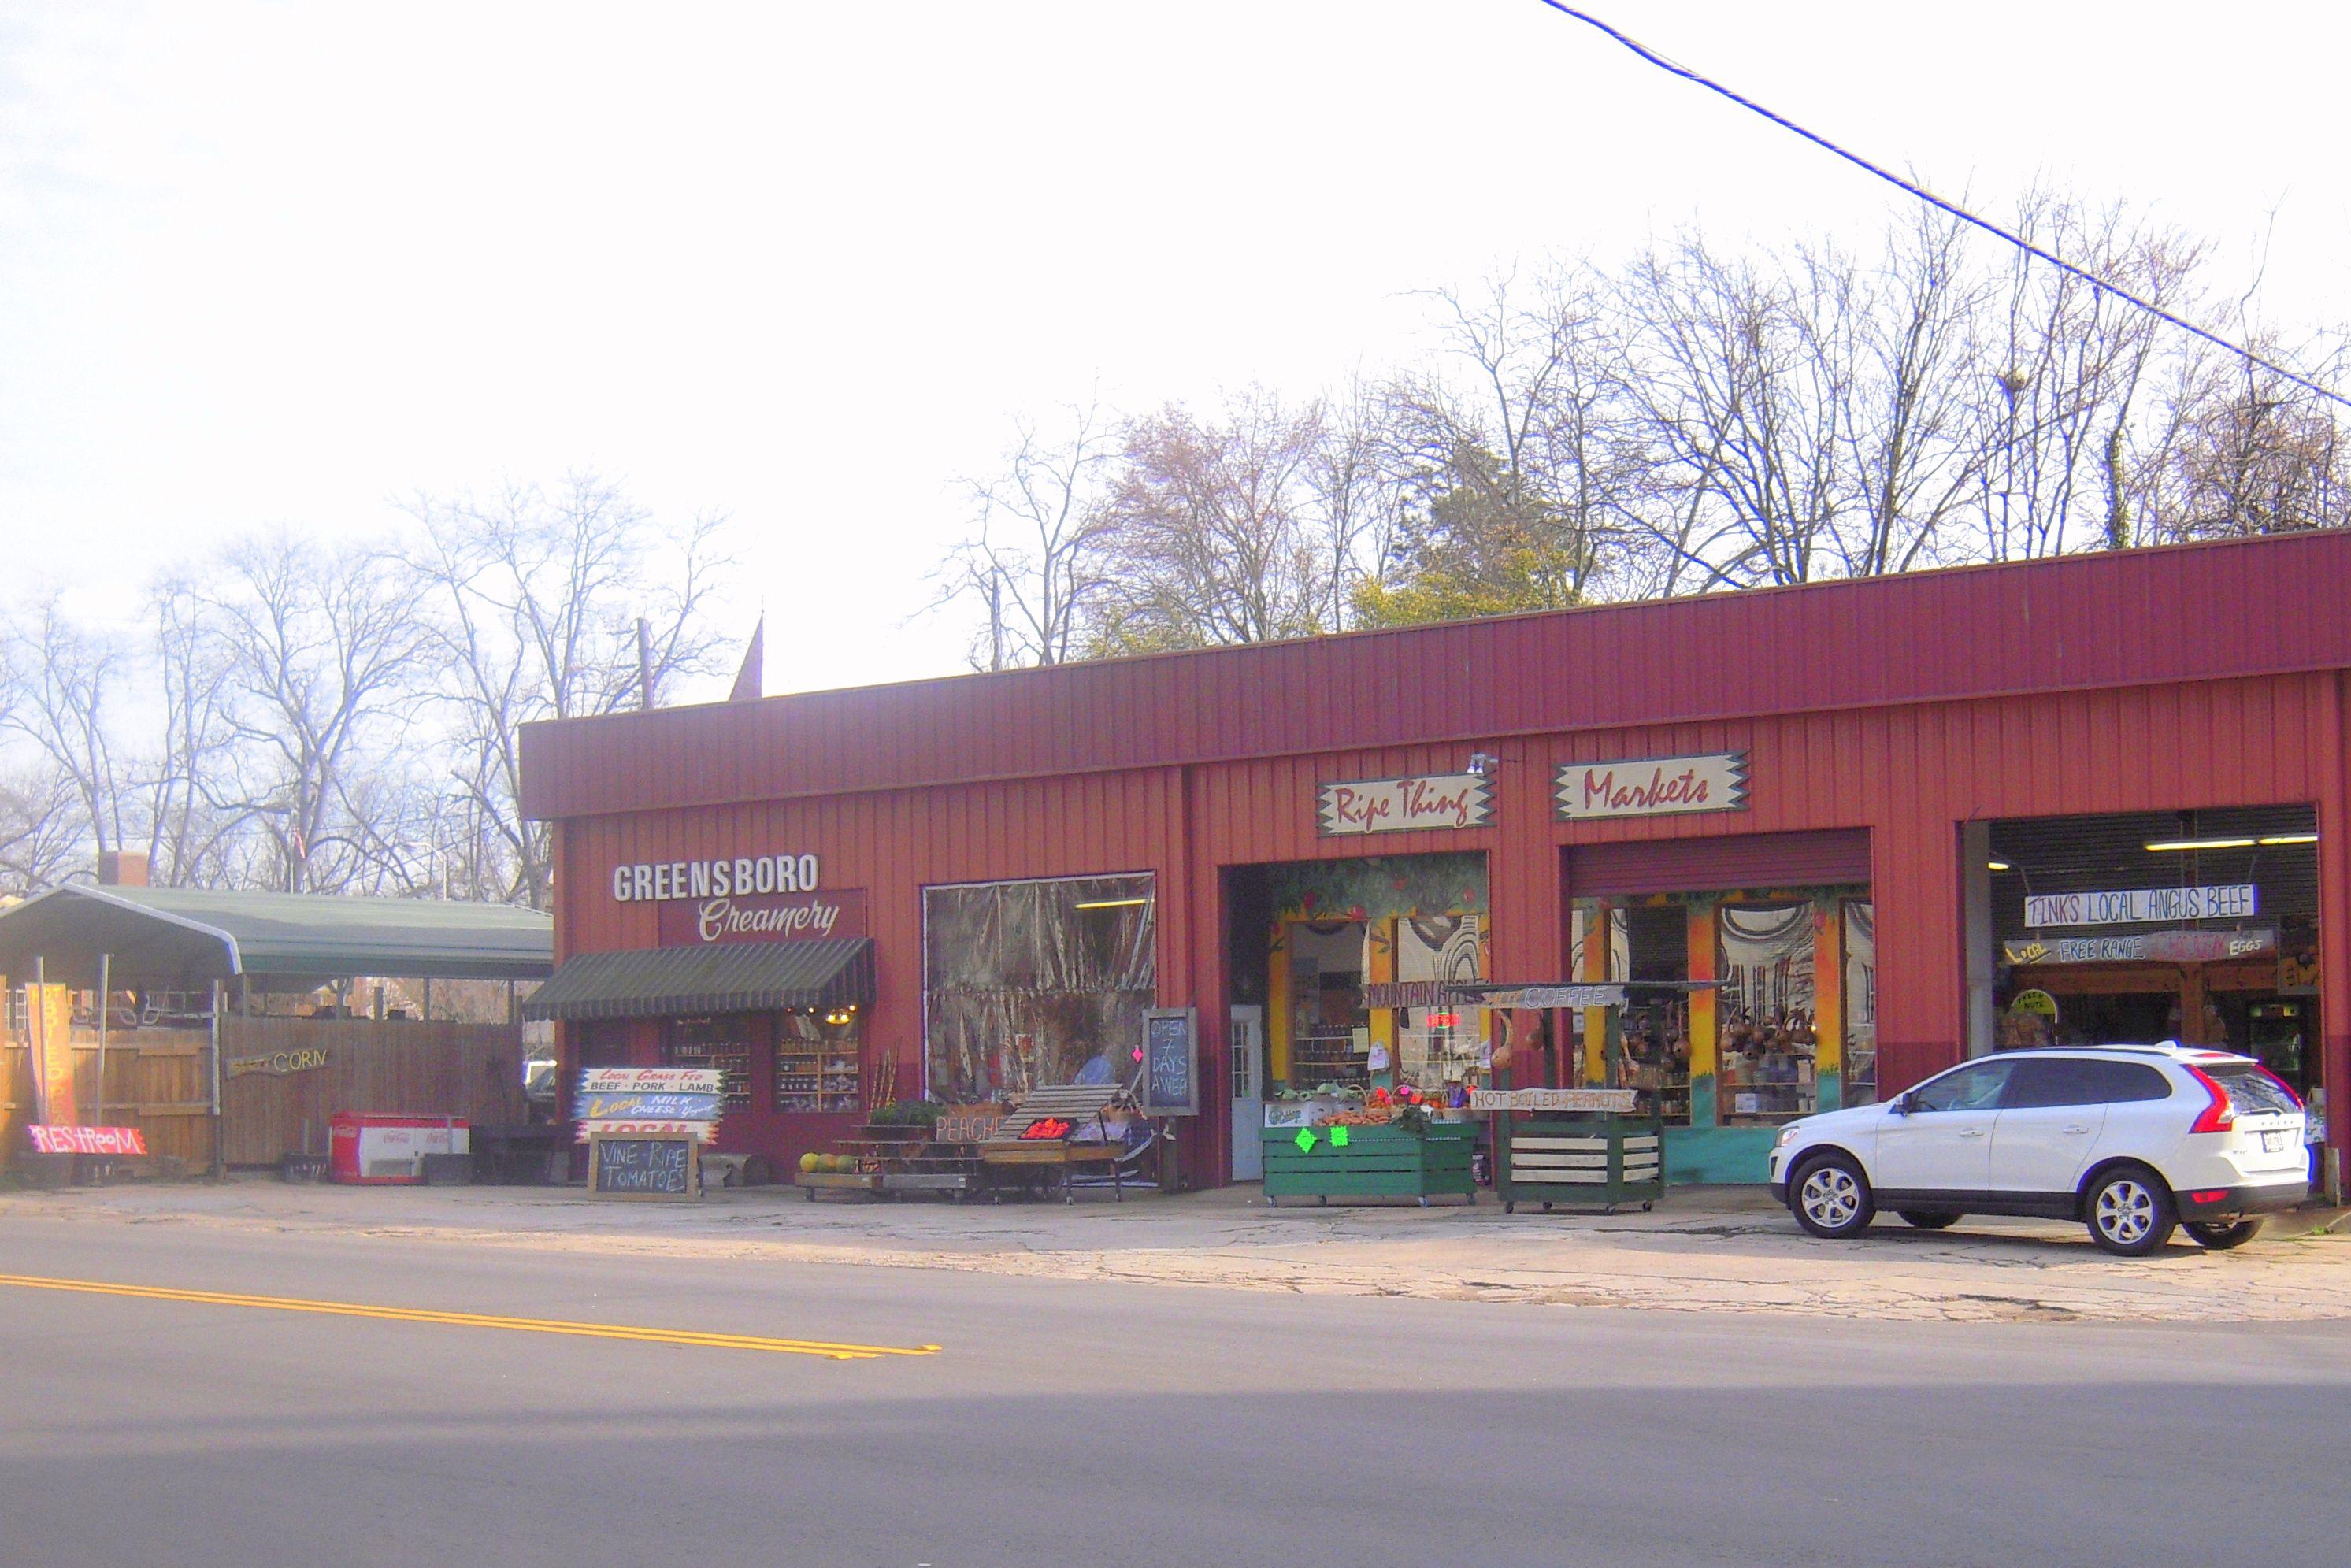 Ripe Thing Market 112 West Broad Street, Greensboro, GA | Favorite ...